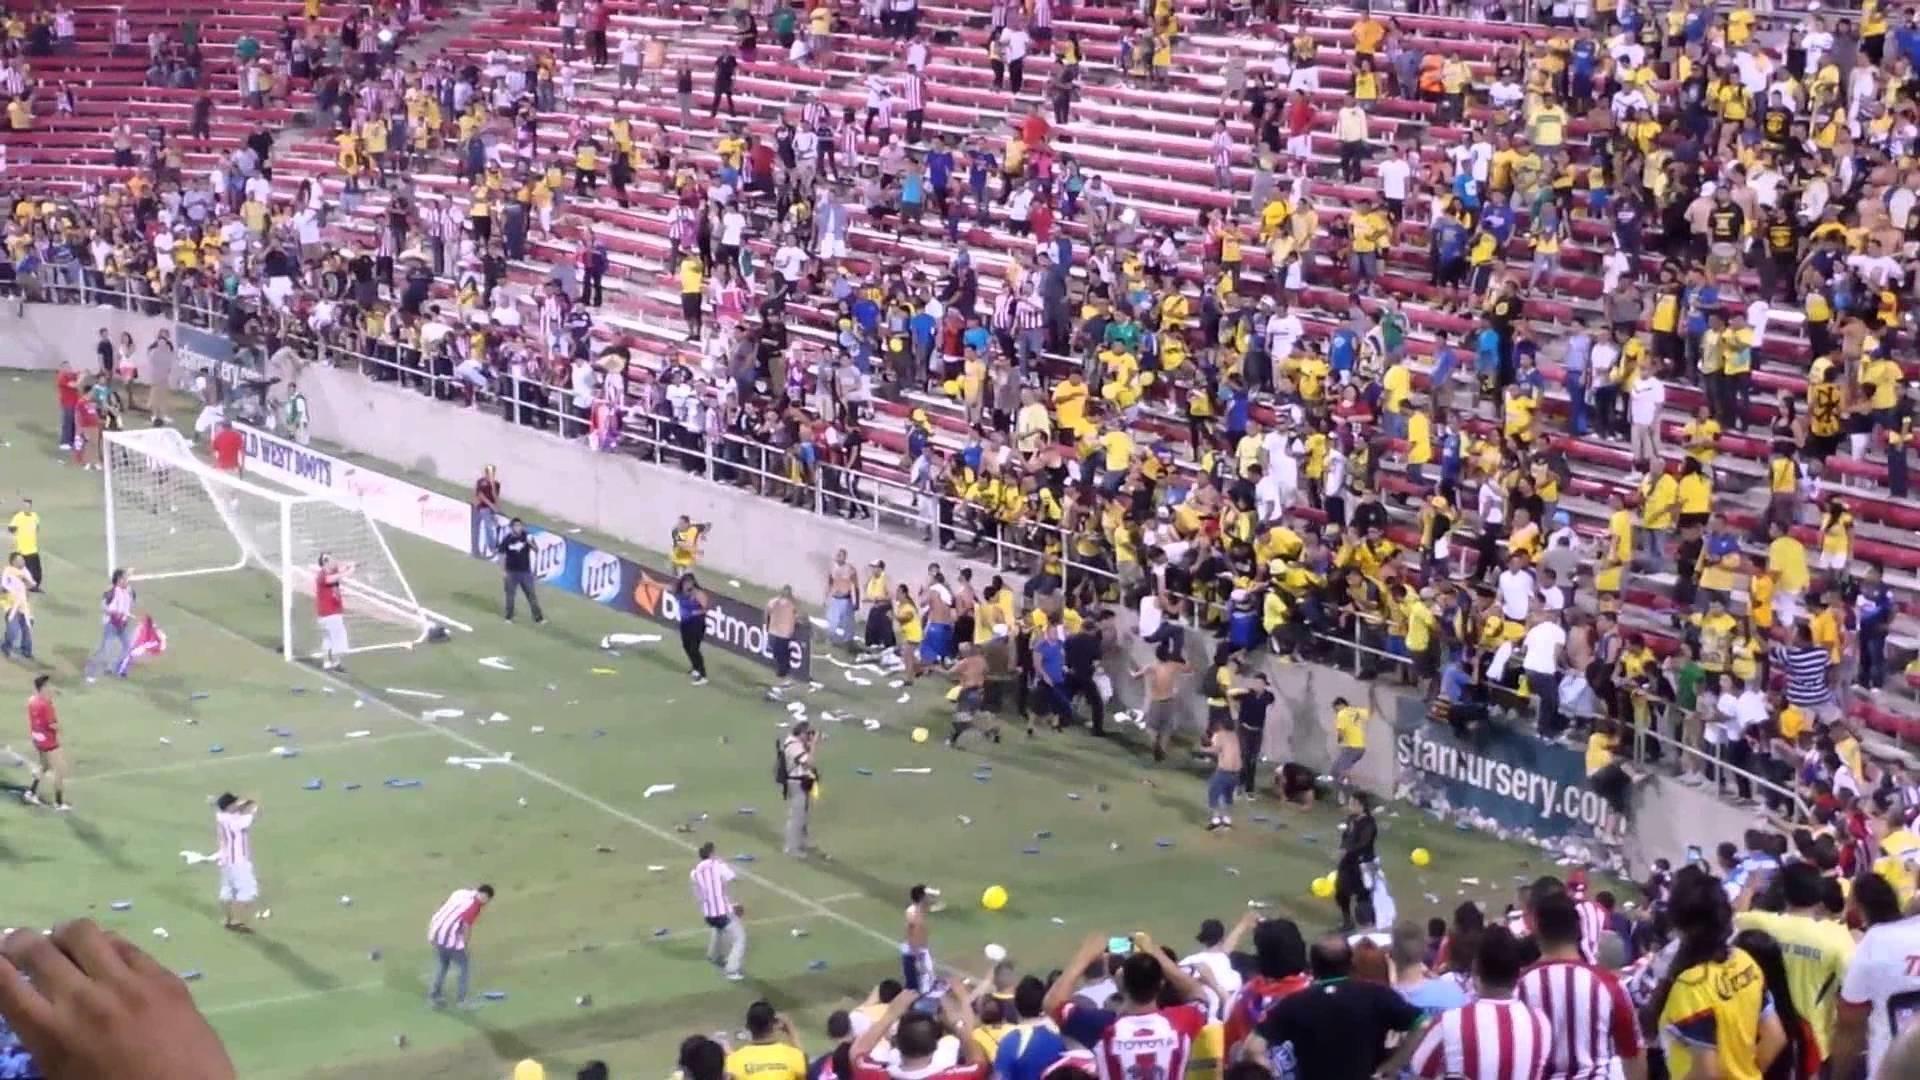 Chivas vs America super clasico en las vegas 2013